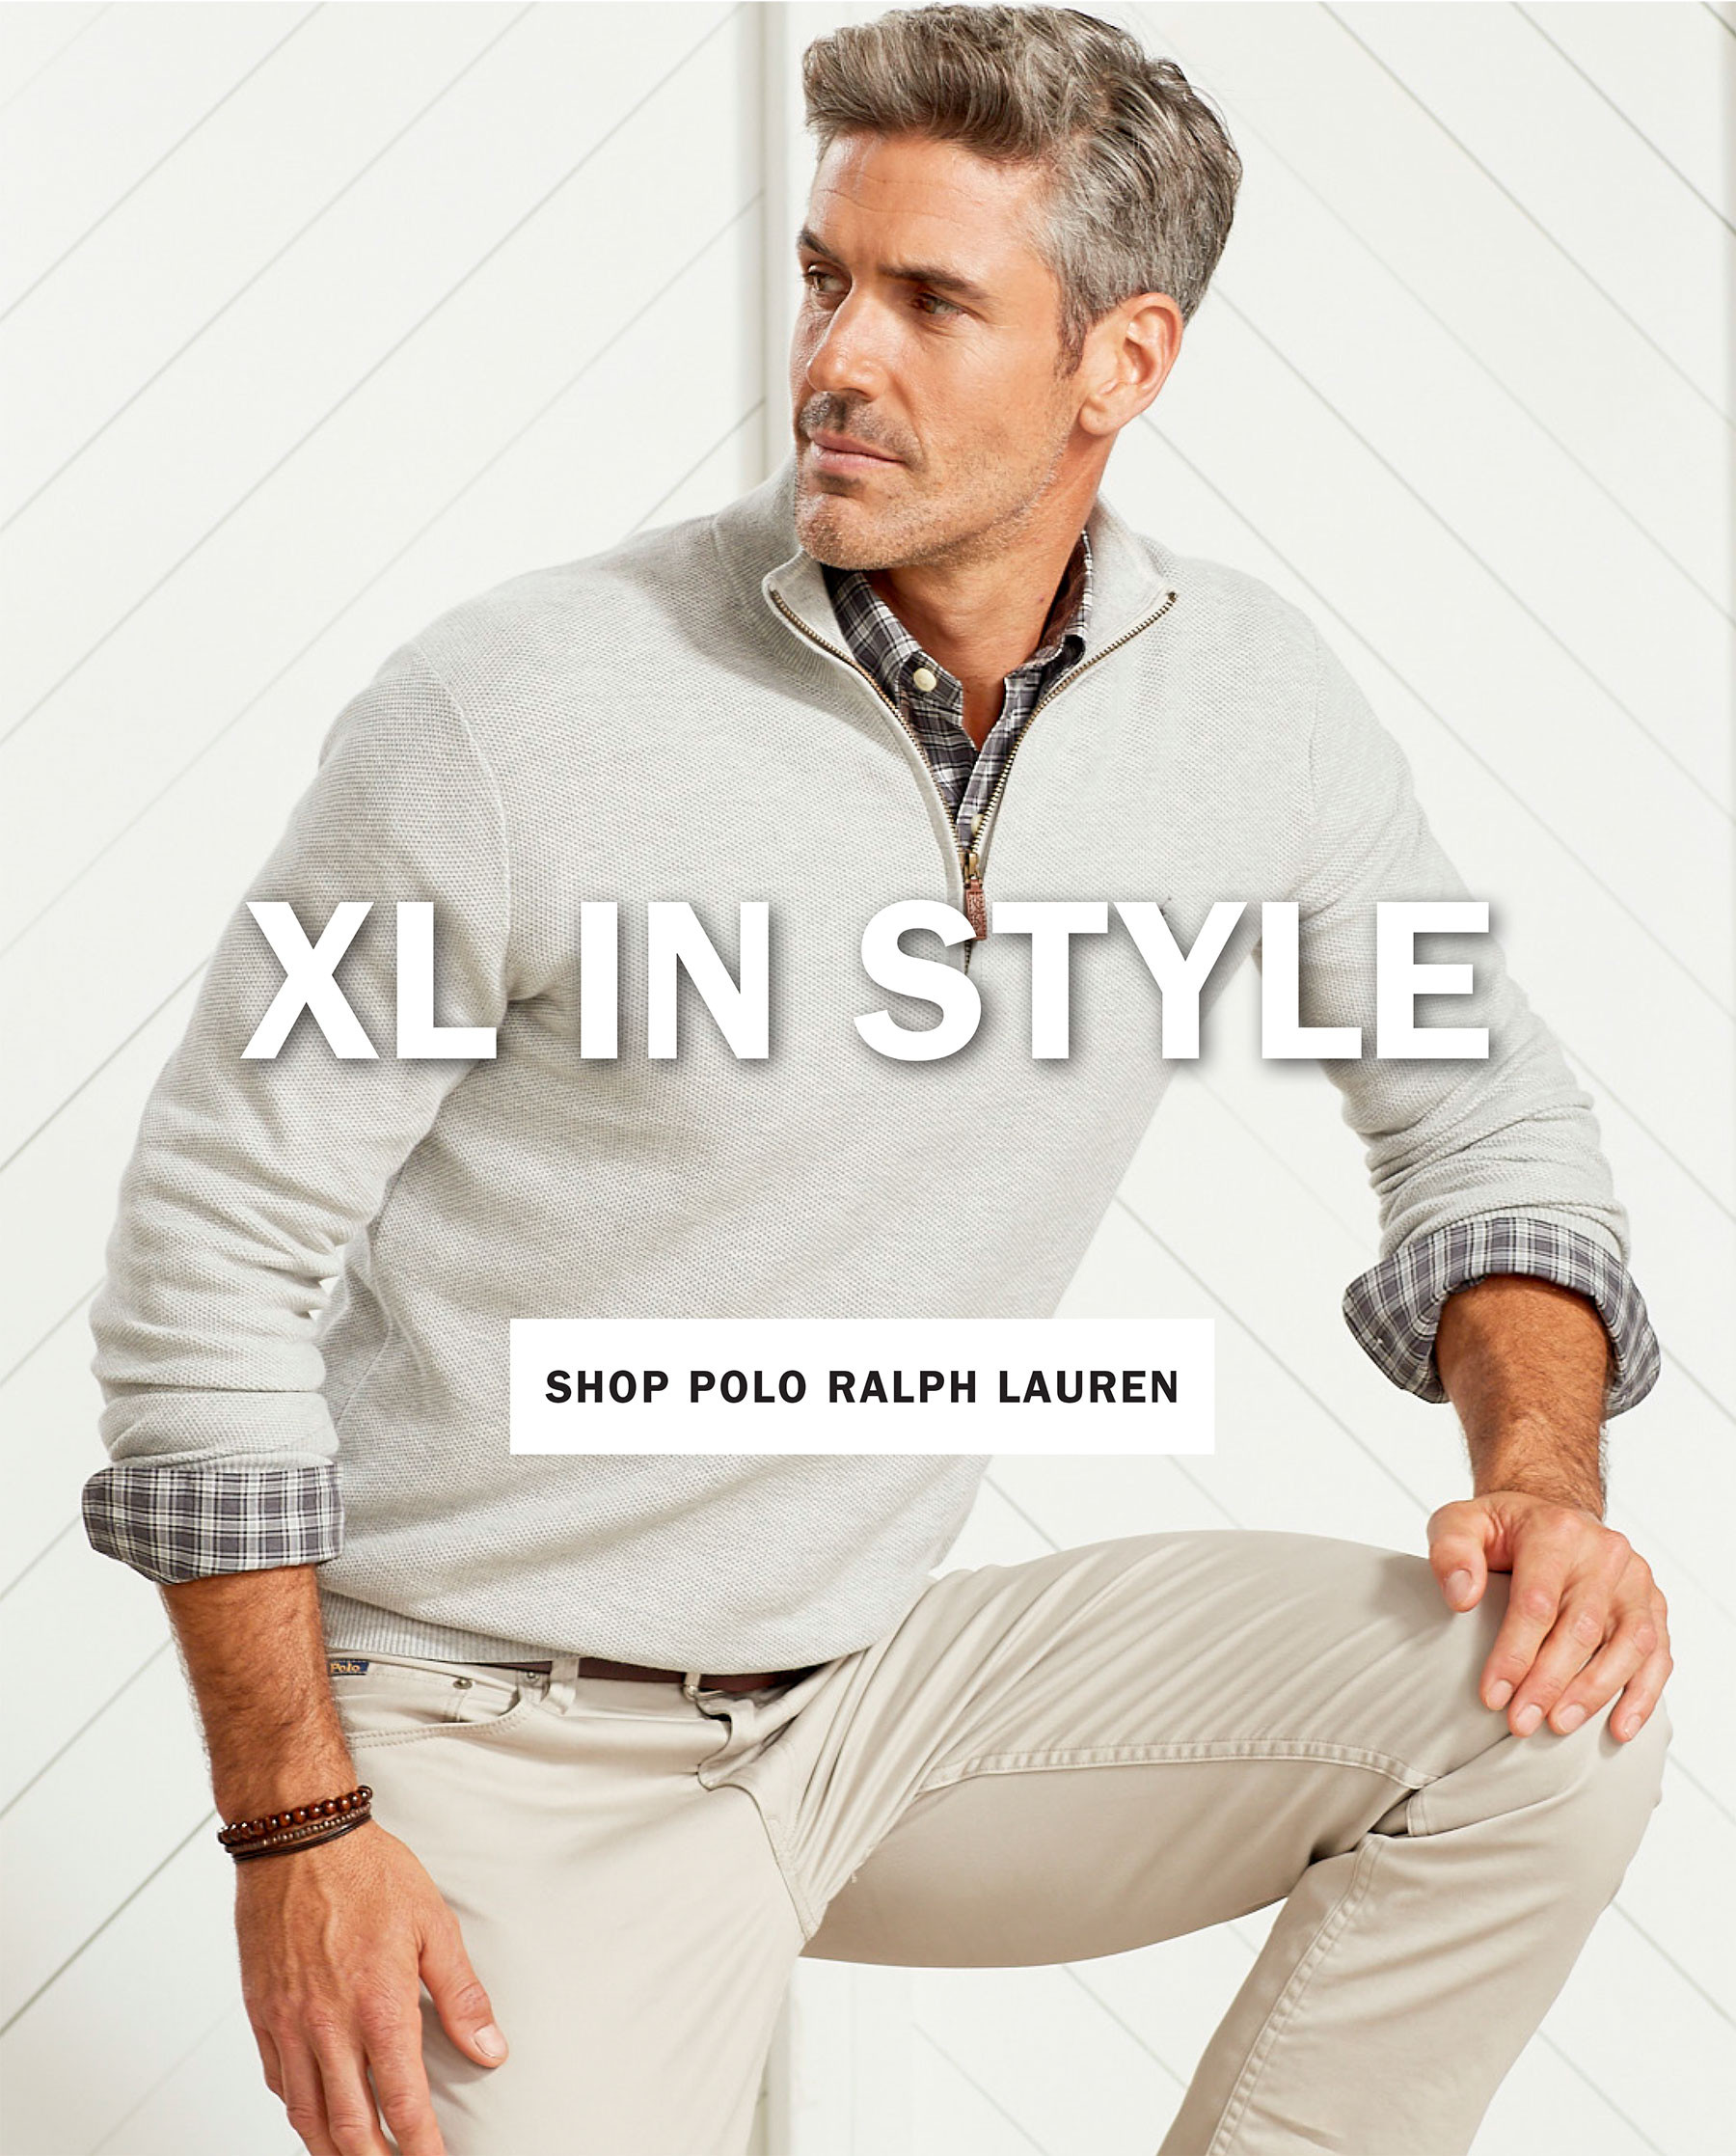 XL IN STLYE | POLO RALPH LAUREN